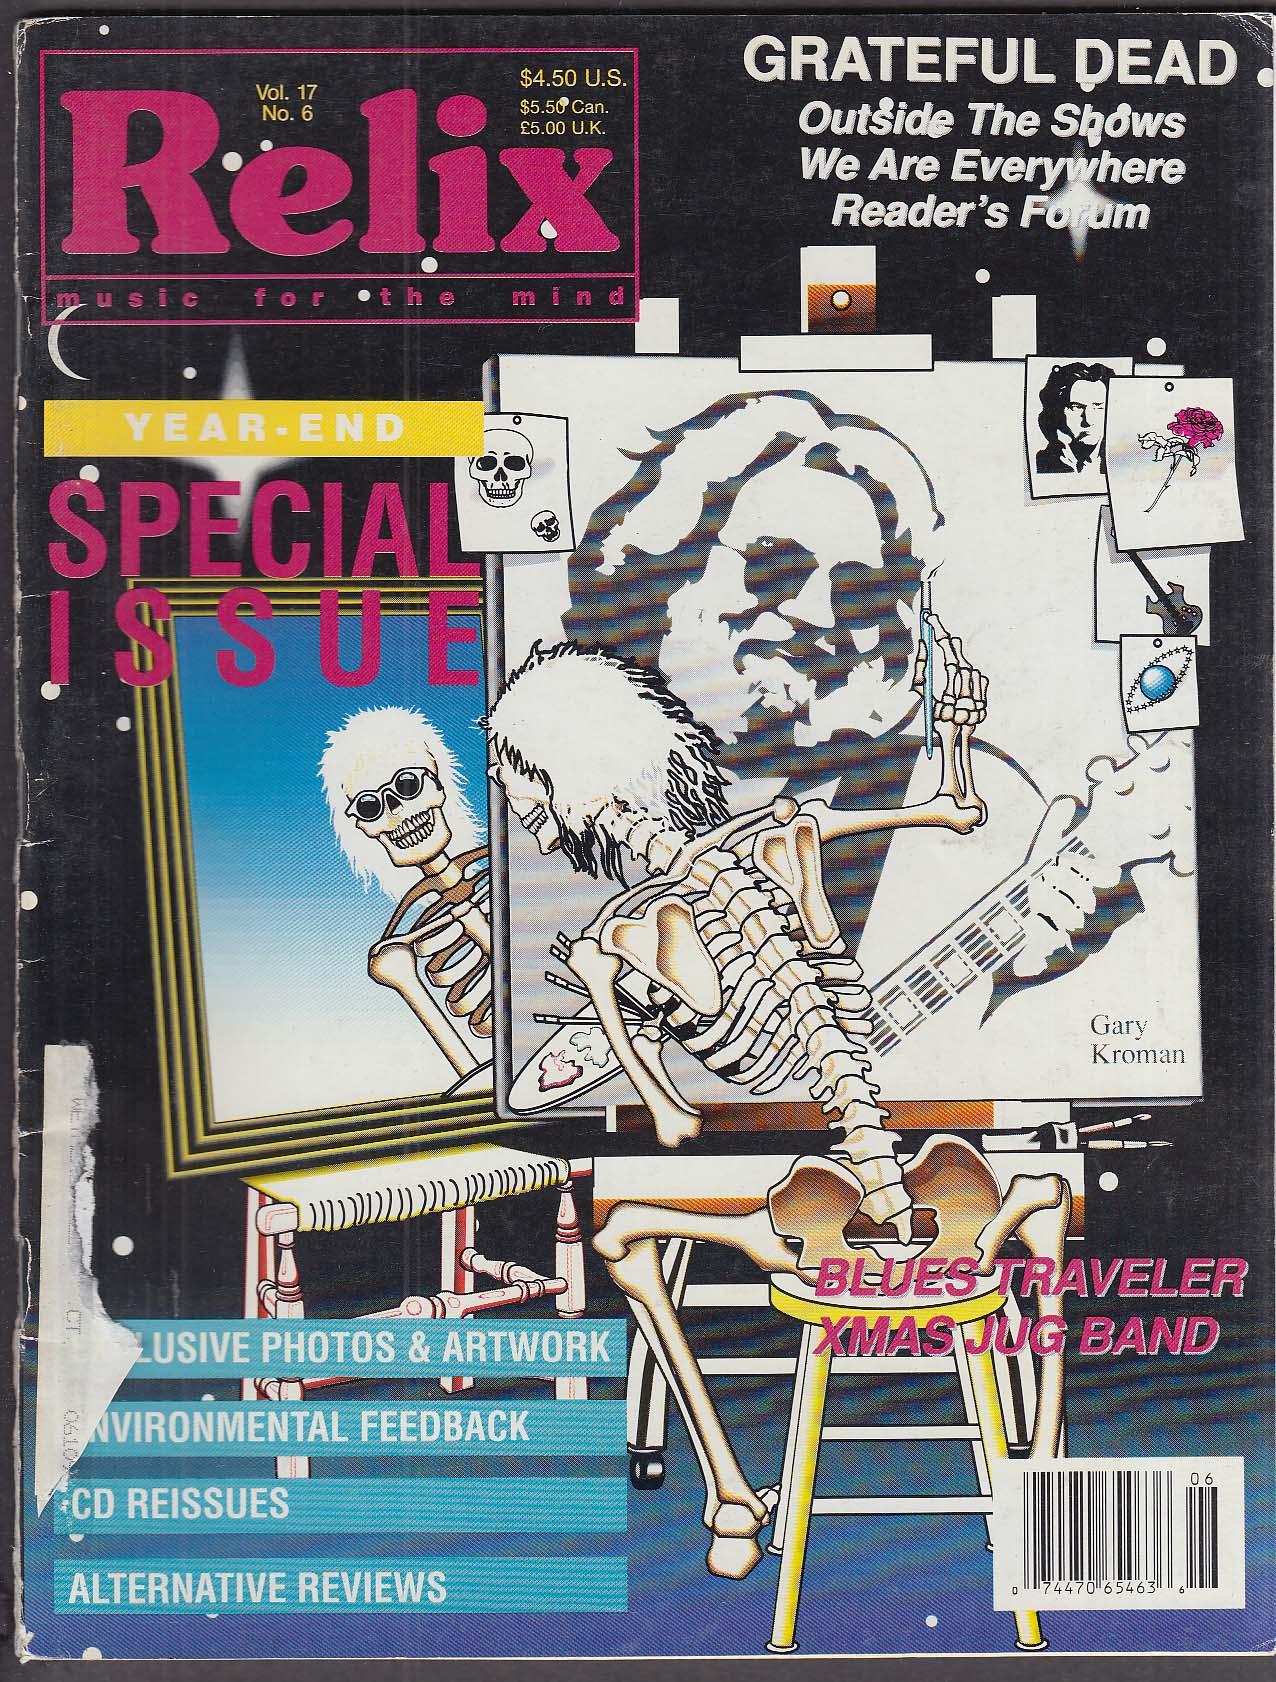 relix grateful dead blues traveler xmas jug band 12 1990 - Blues Traveler Christmas